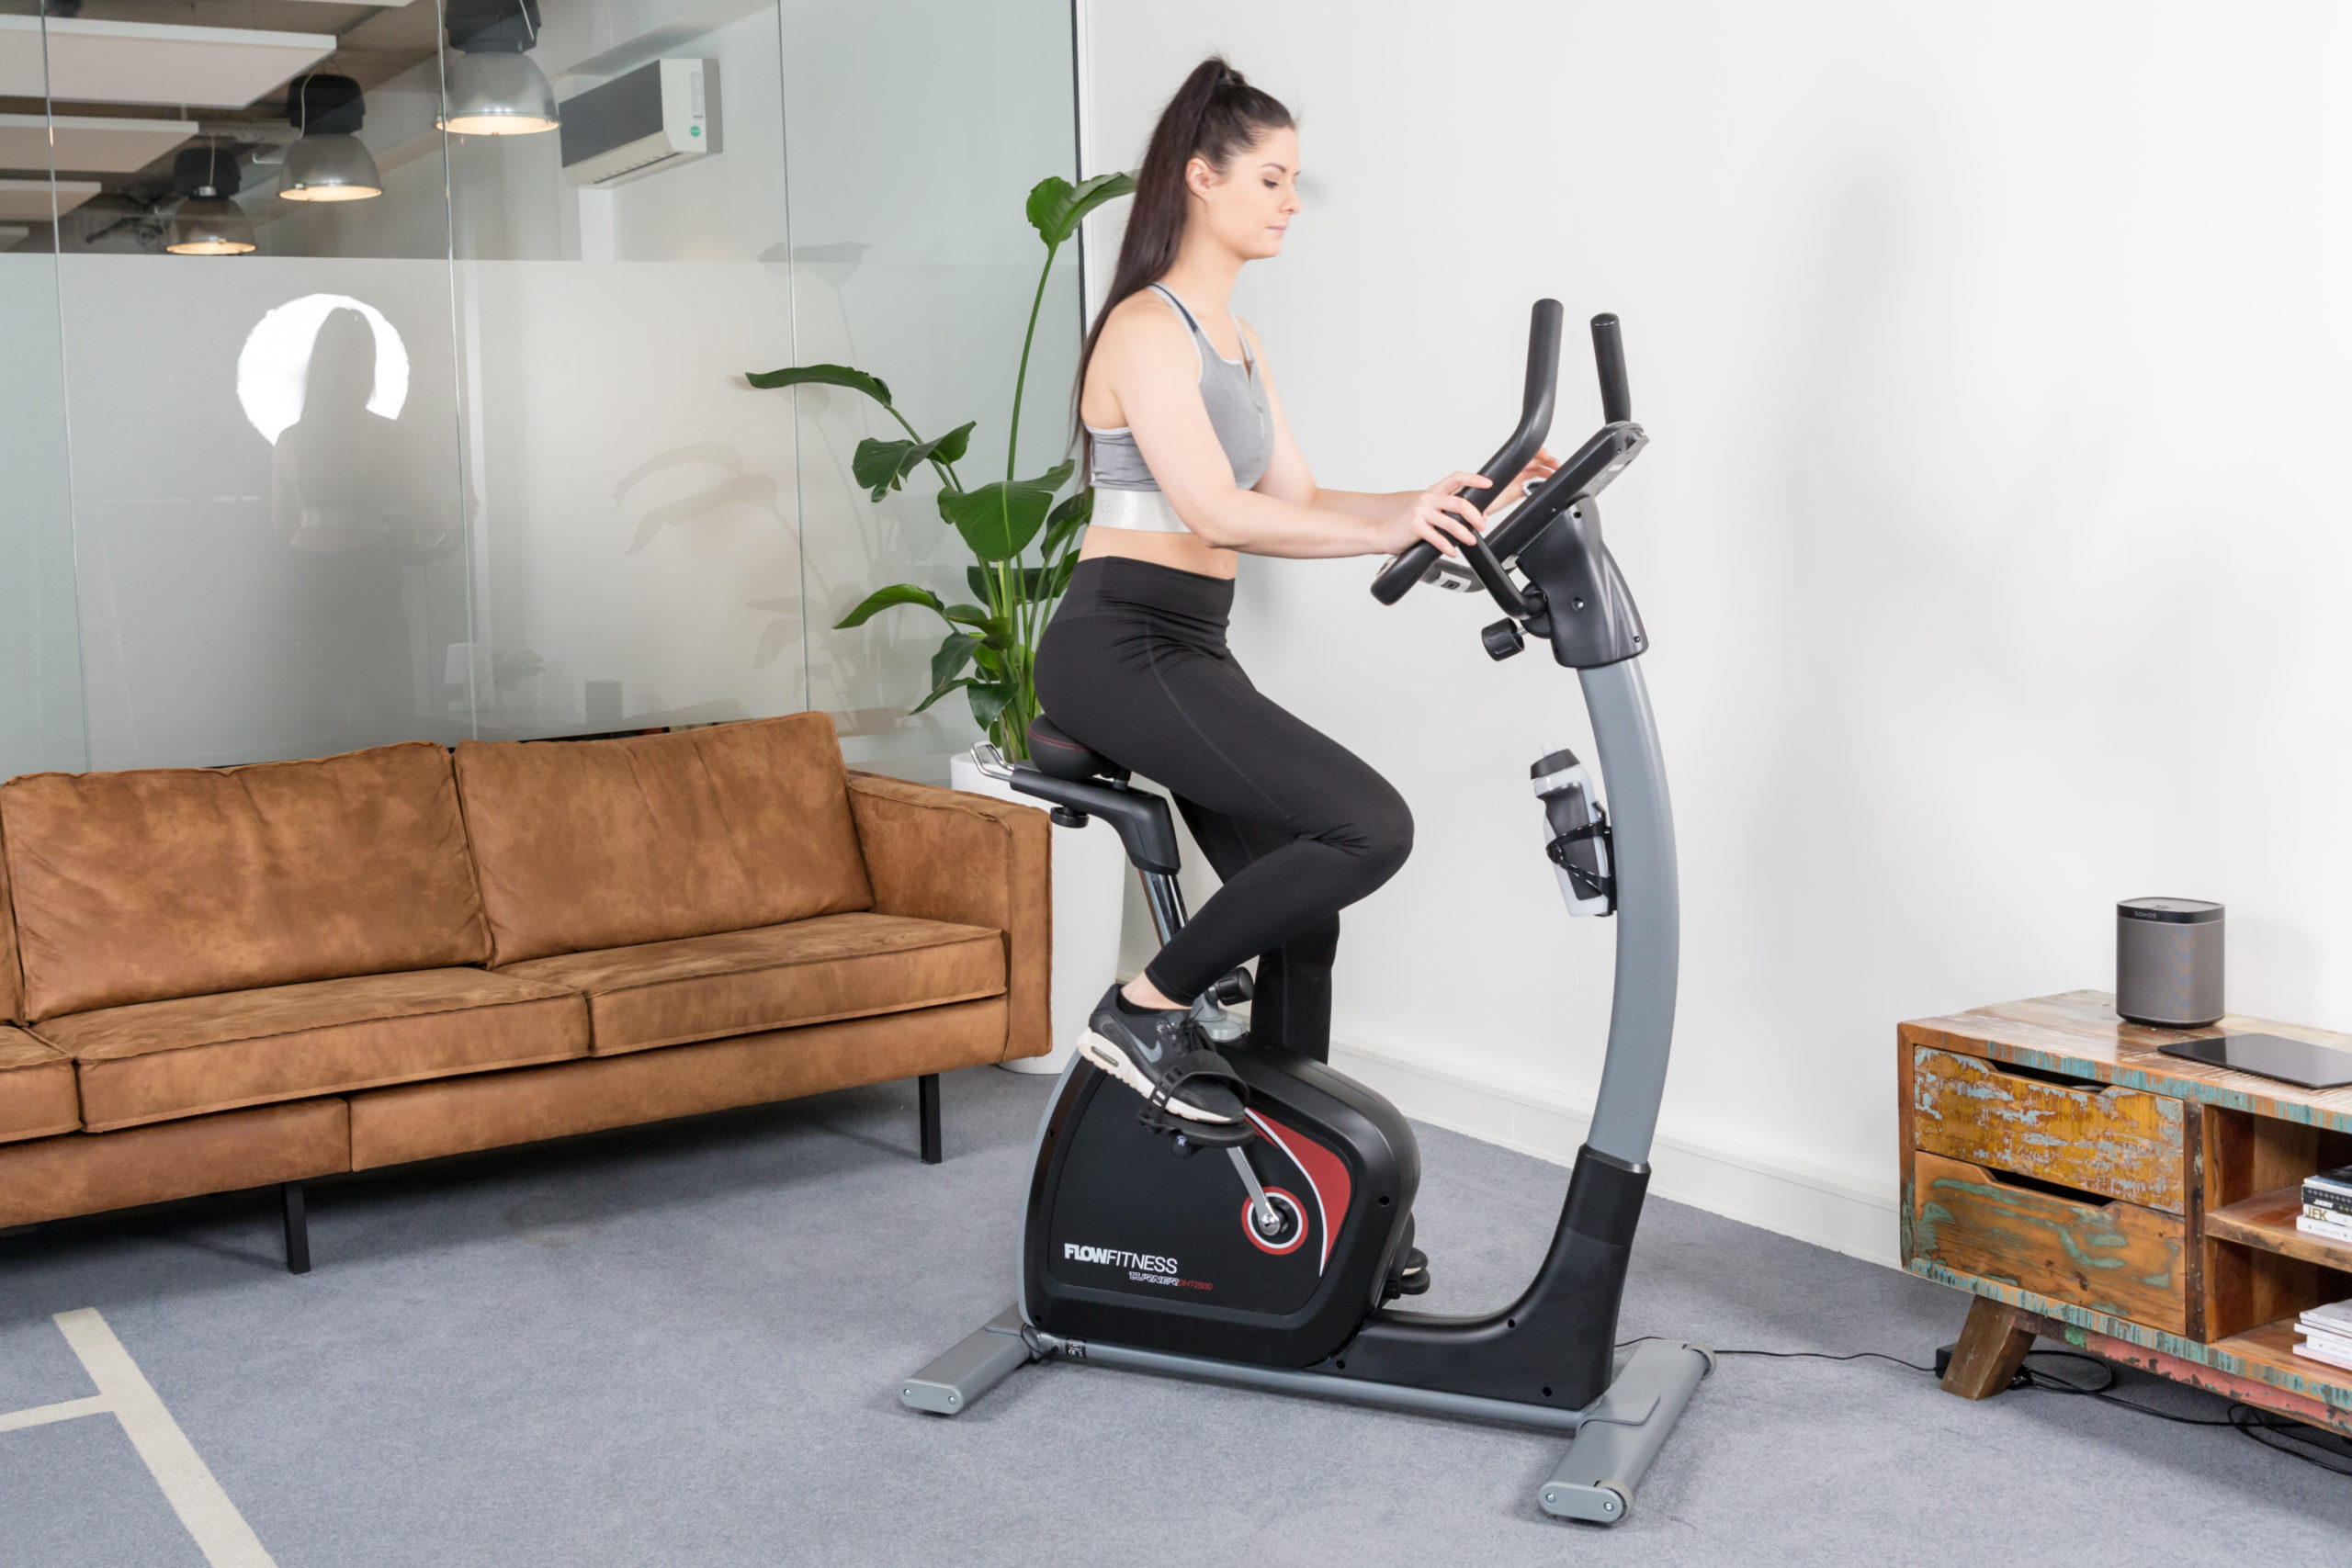 Flow Fitness Tabel Turner DHT2500i Hometrainer 13